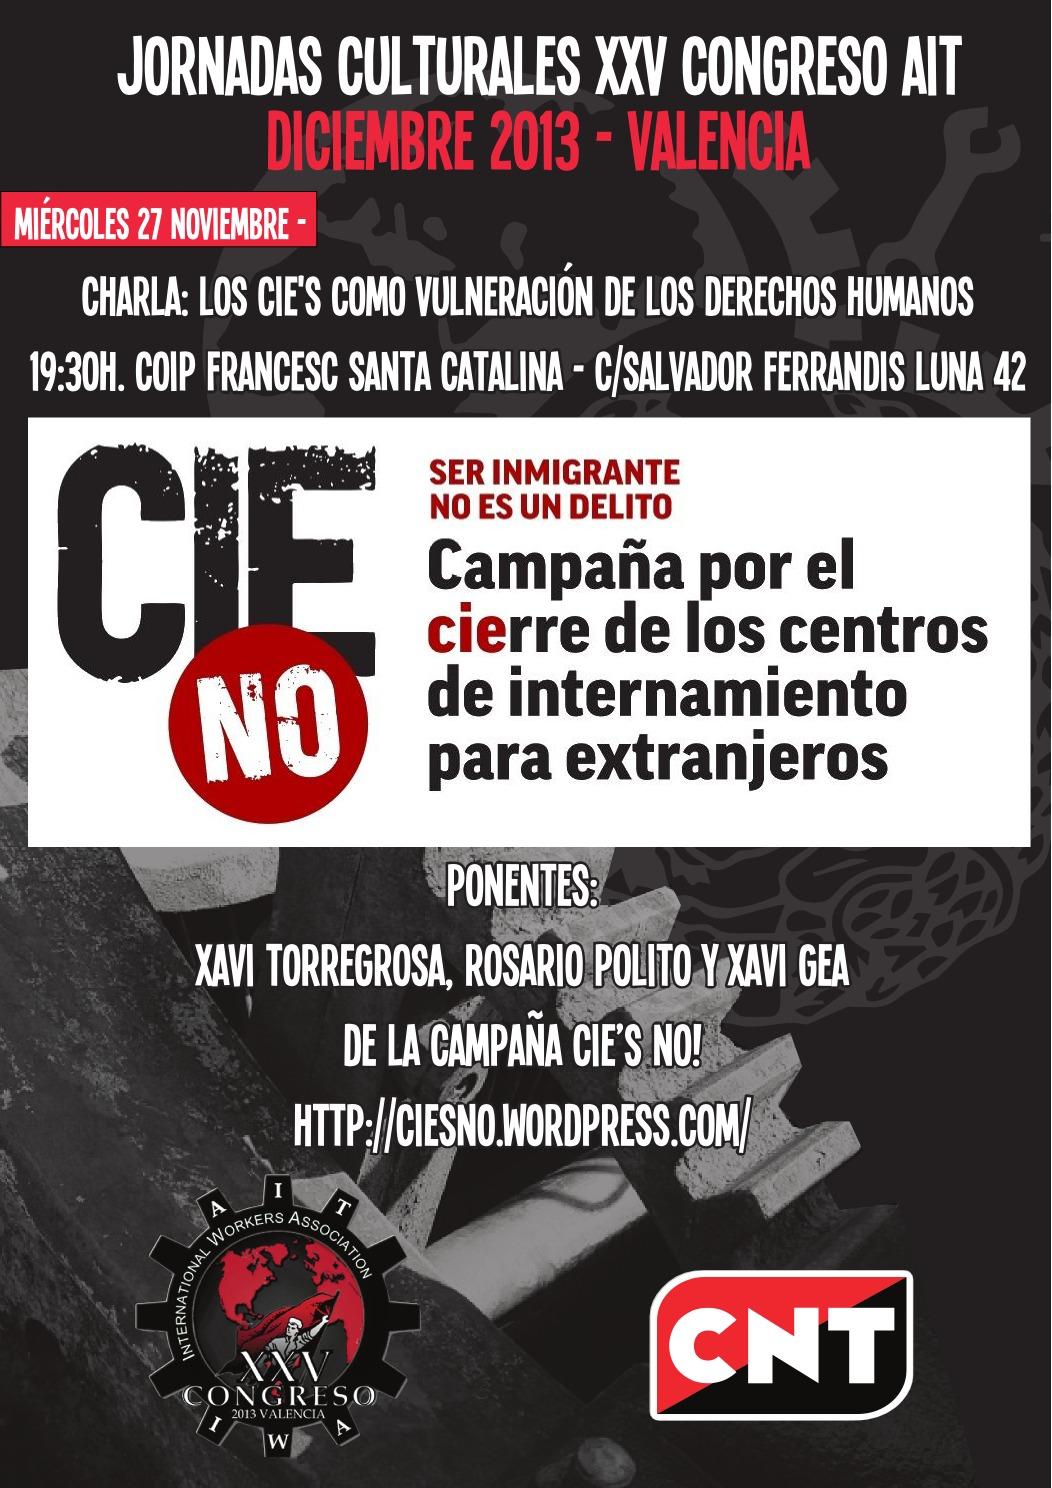 http://valencia.cnt.es/wp-content/uploads/2013/11/CIE2.jpg